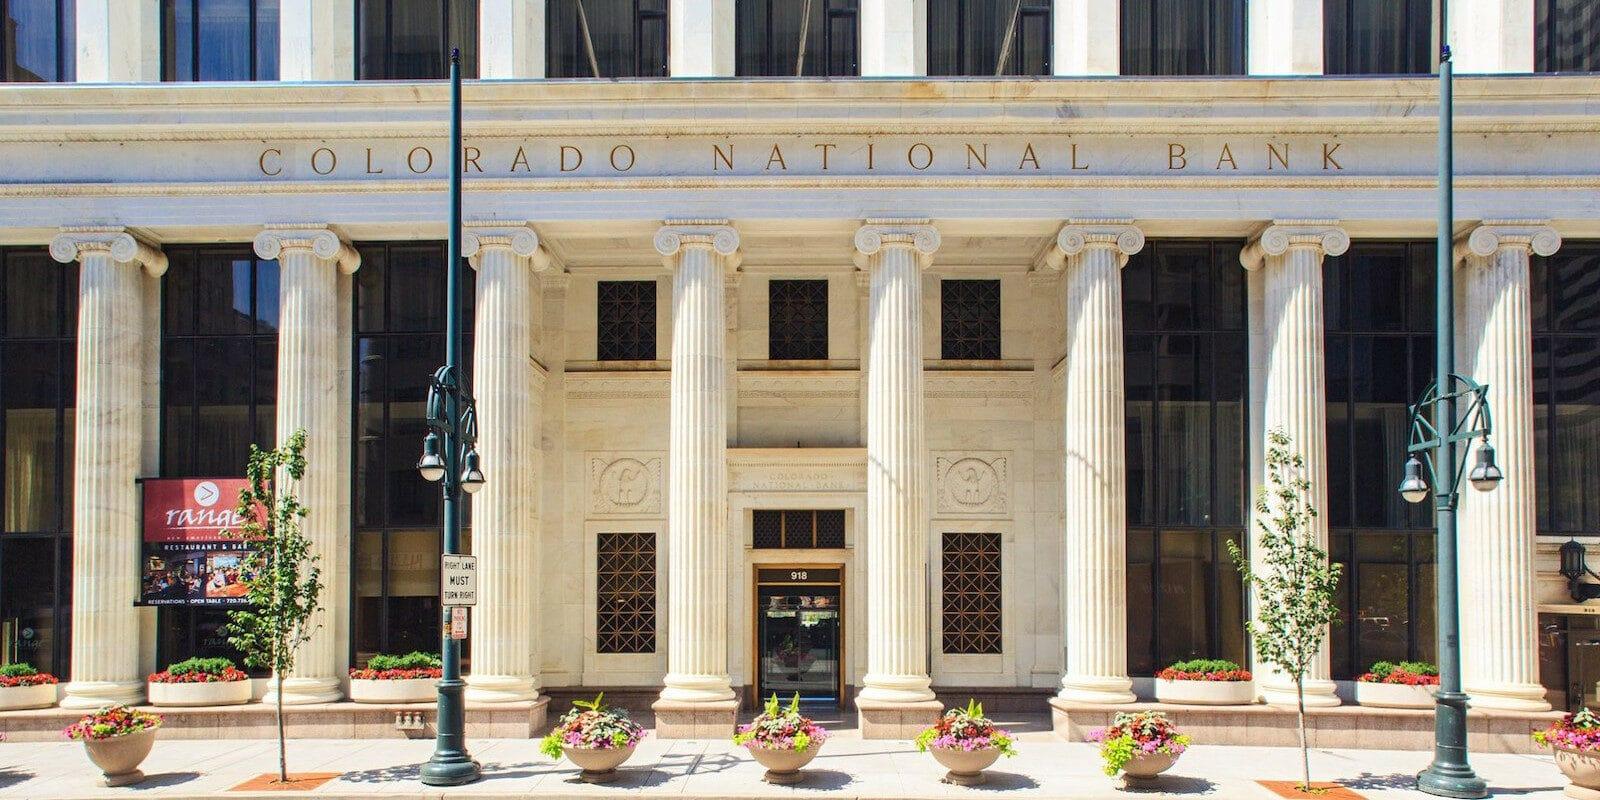 Image of the Colorado National Bank home to the Renaissance Denver Downtown City Center Hote